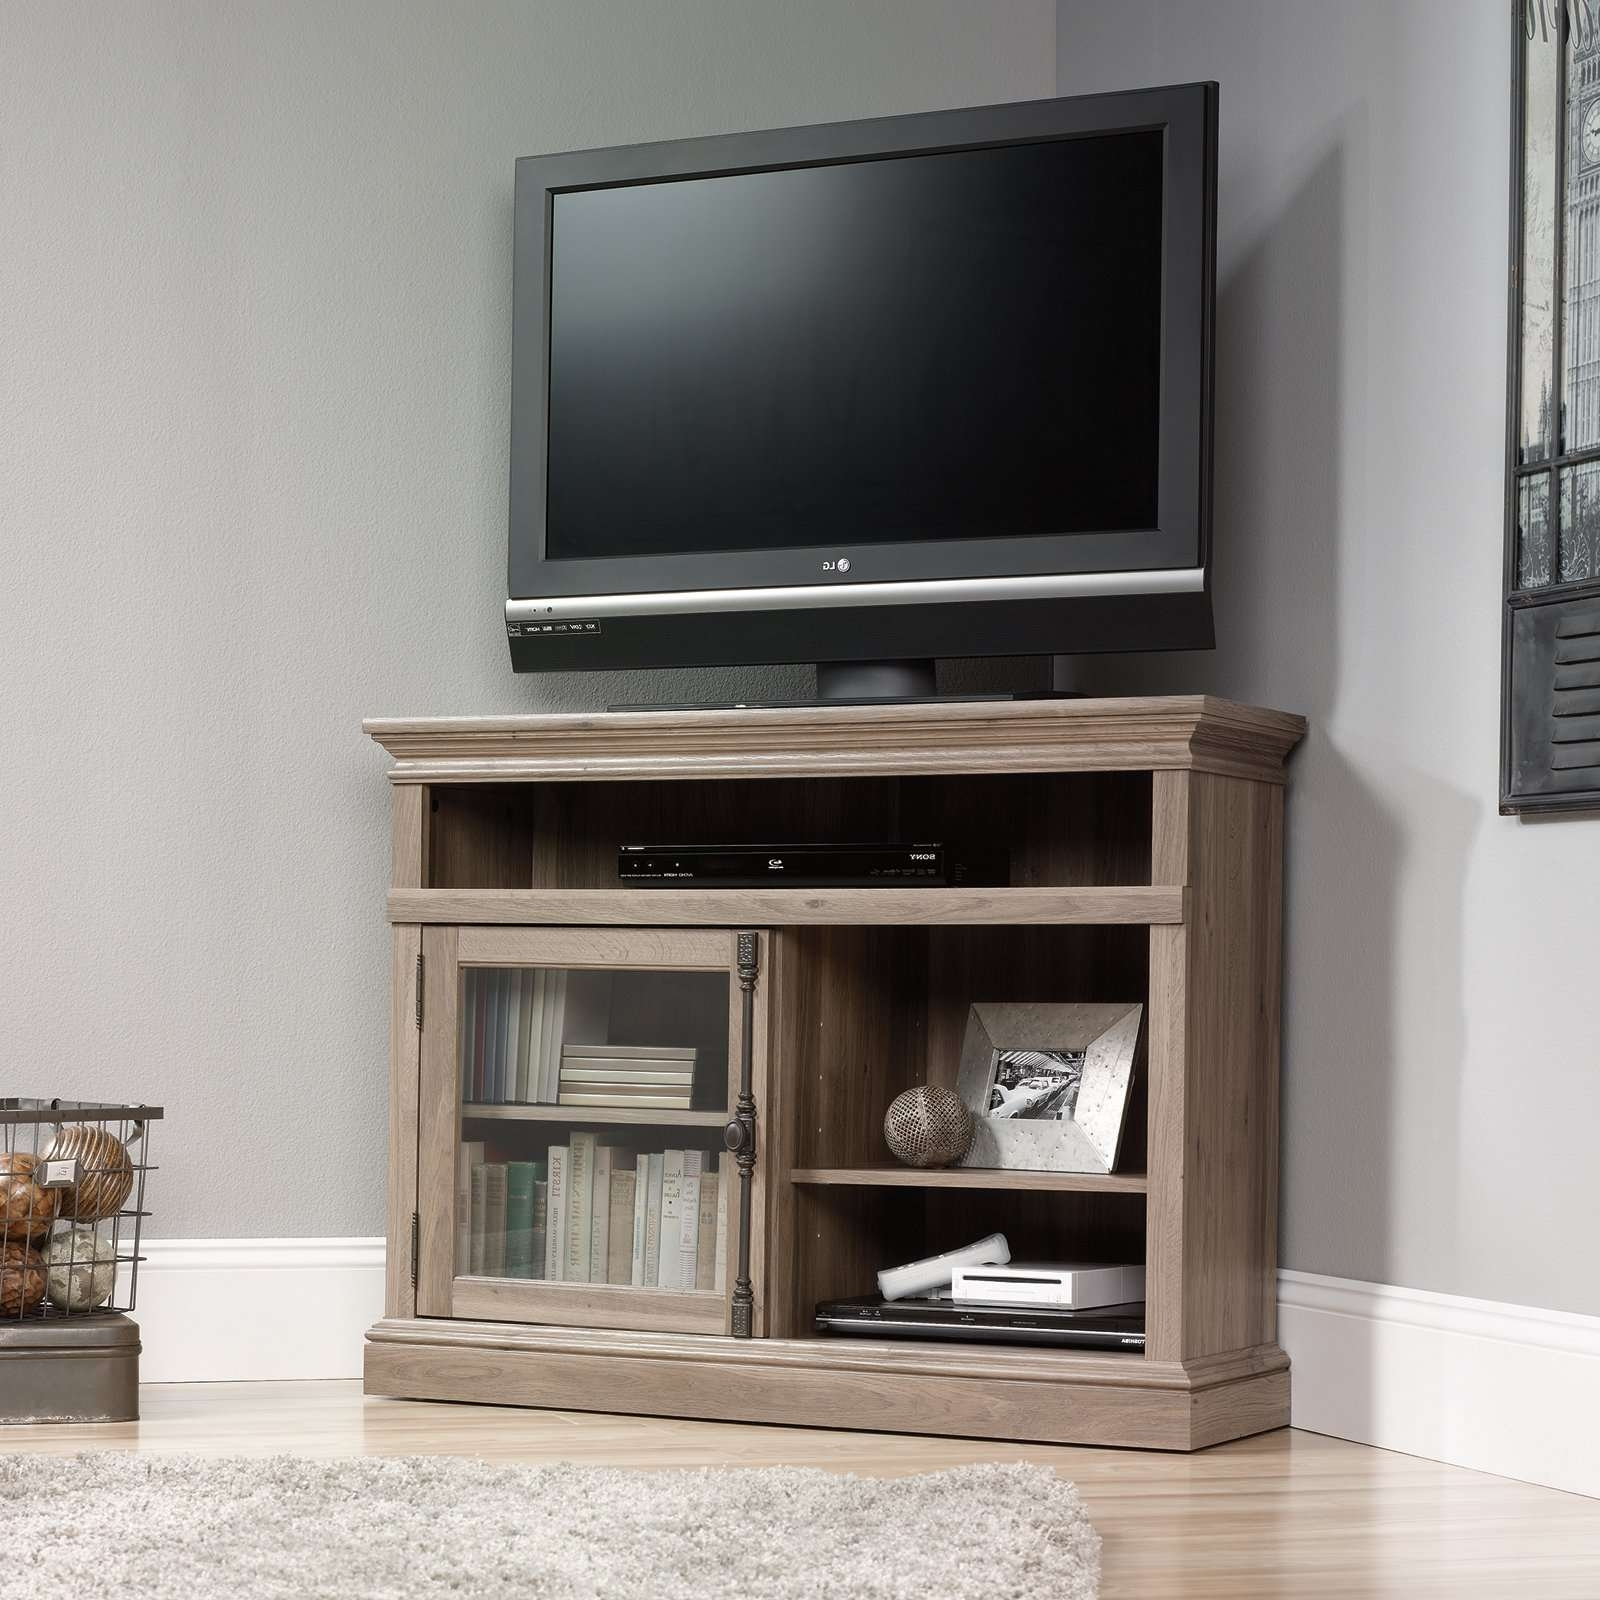 Tv : Cheap Oak Tv Stands Alluring Oak Tv Stand Second Hand Inside Cheap Oak Tv Stands (View 9 of 15)